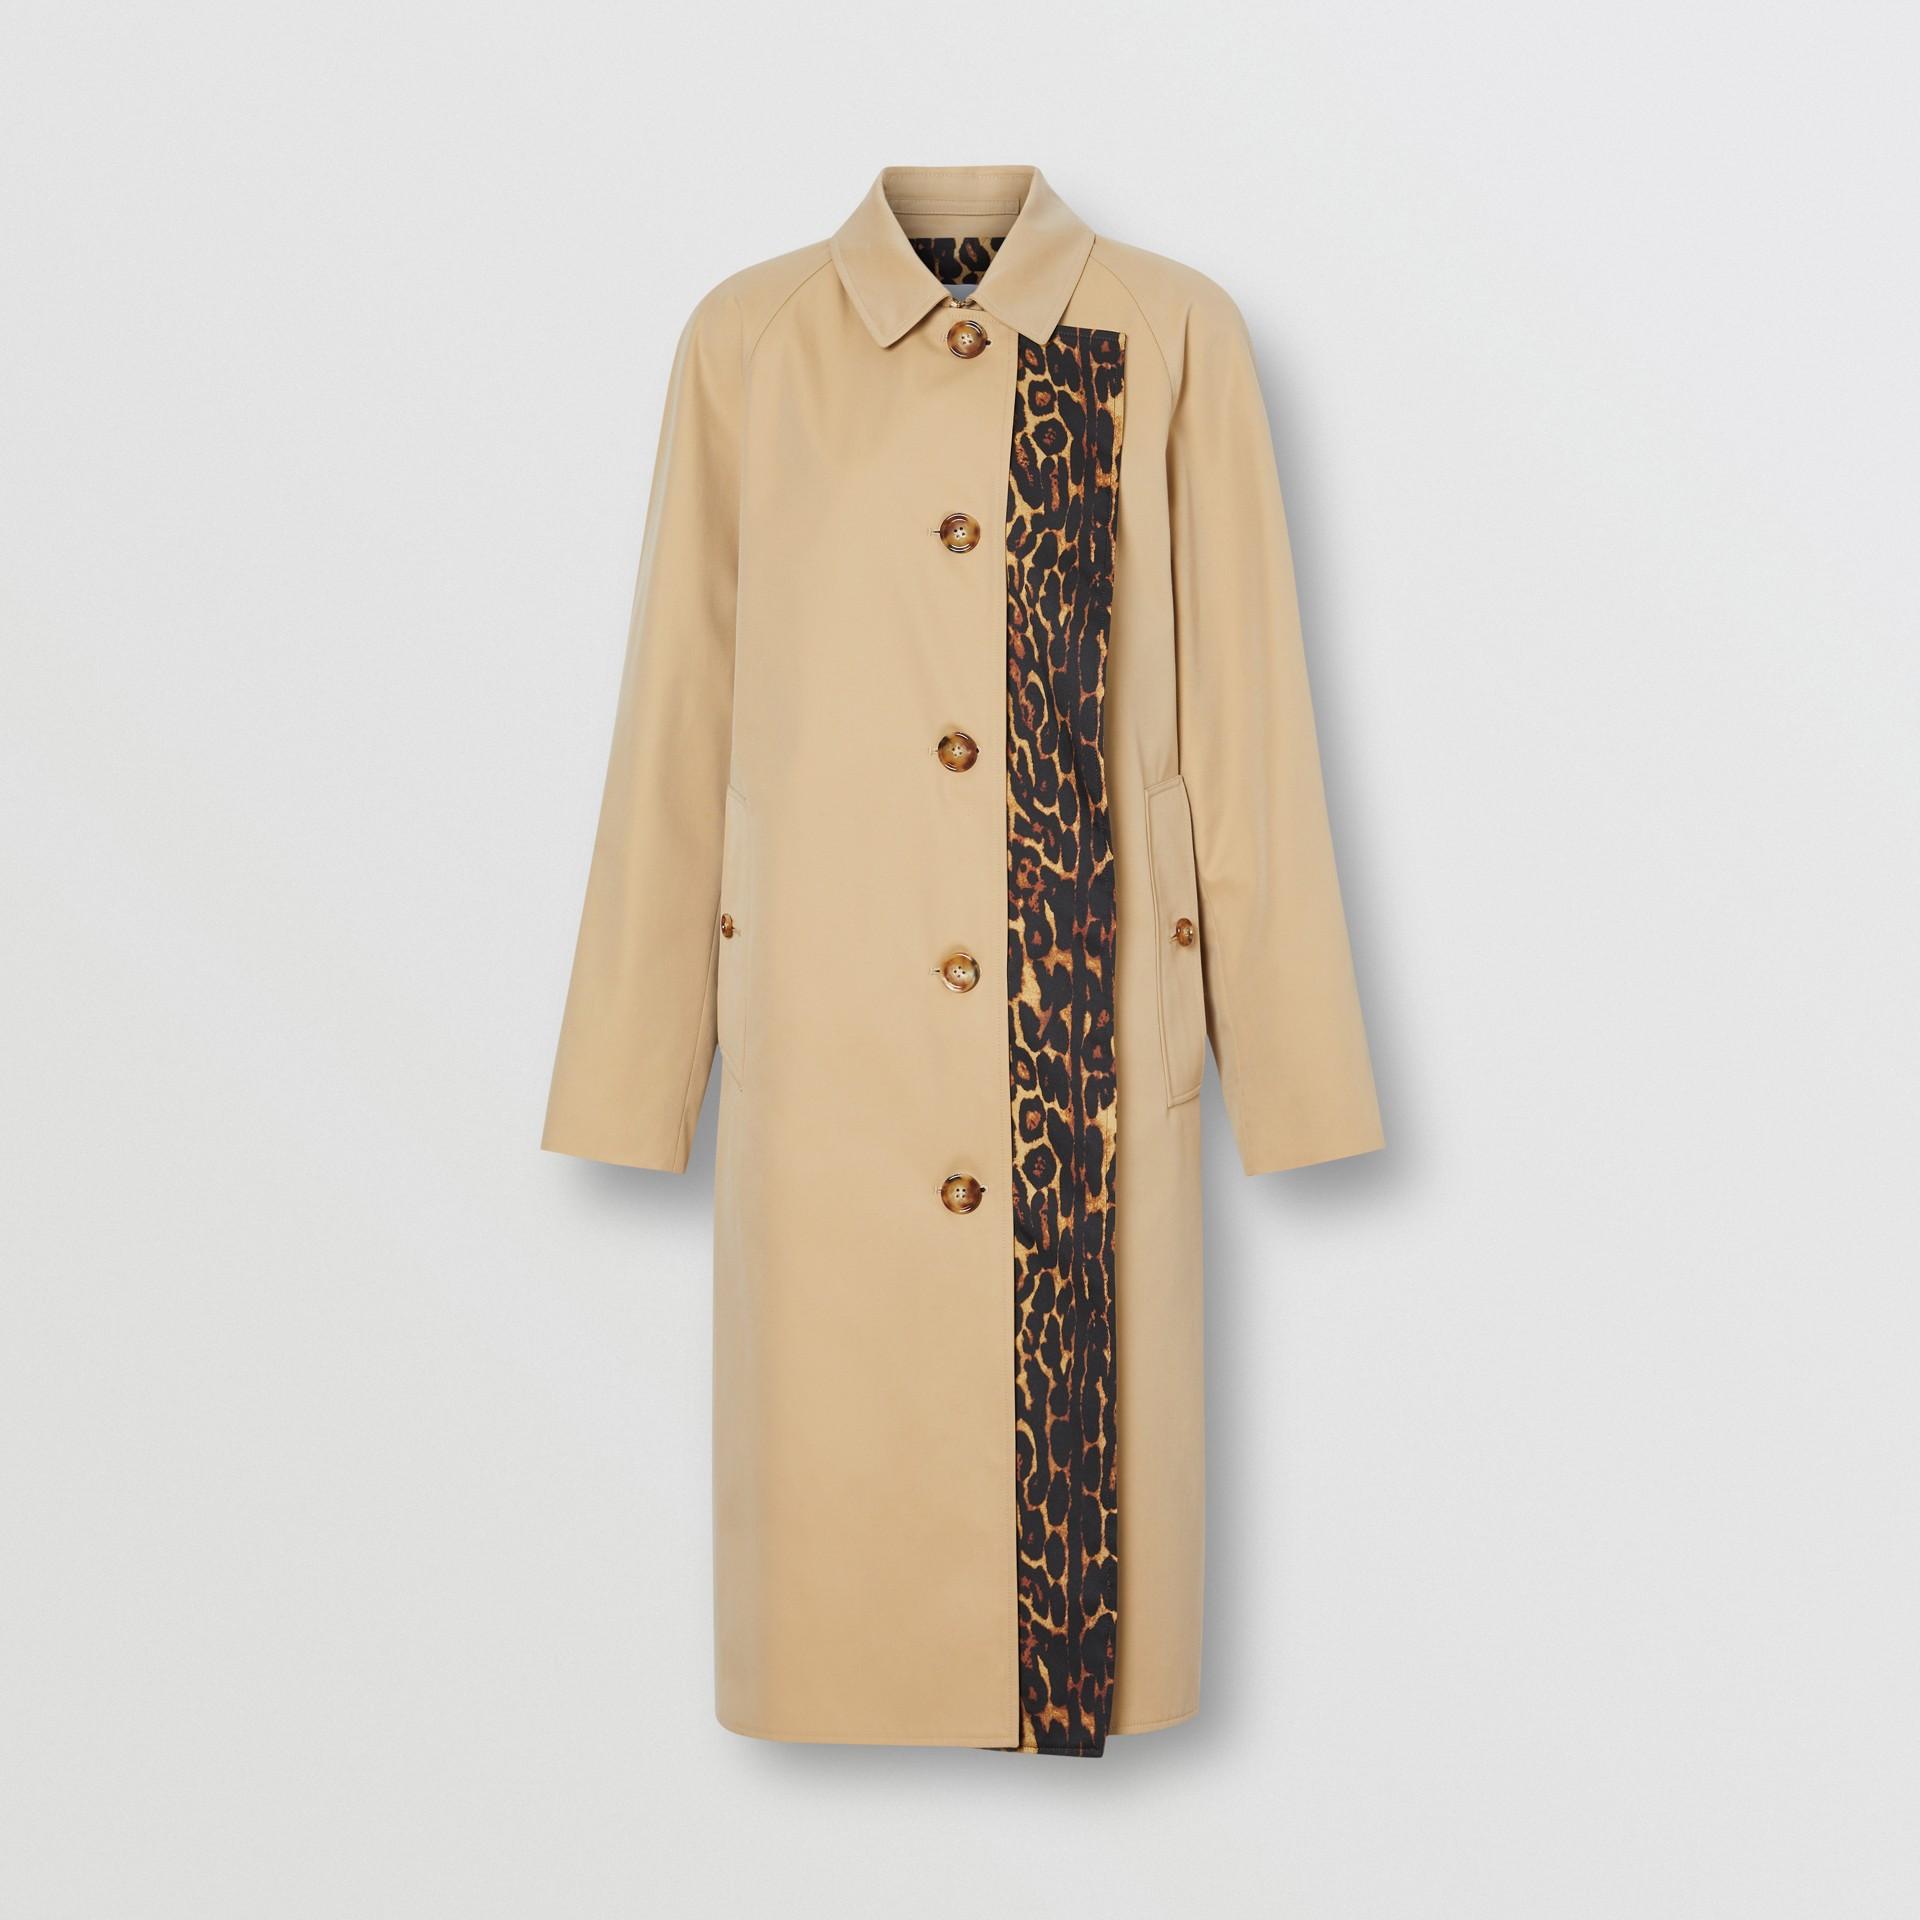 Leopard Print-lined Cotton Gabardine Car Coat in Honey - Women | Burberry United Kingdom - gallery image 2